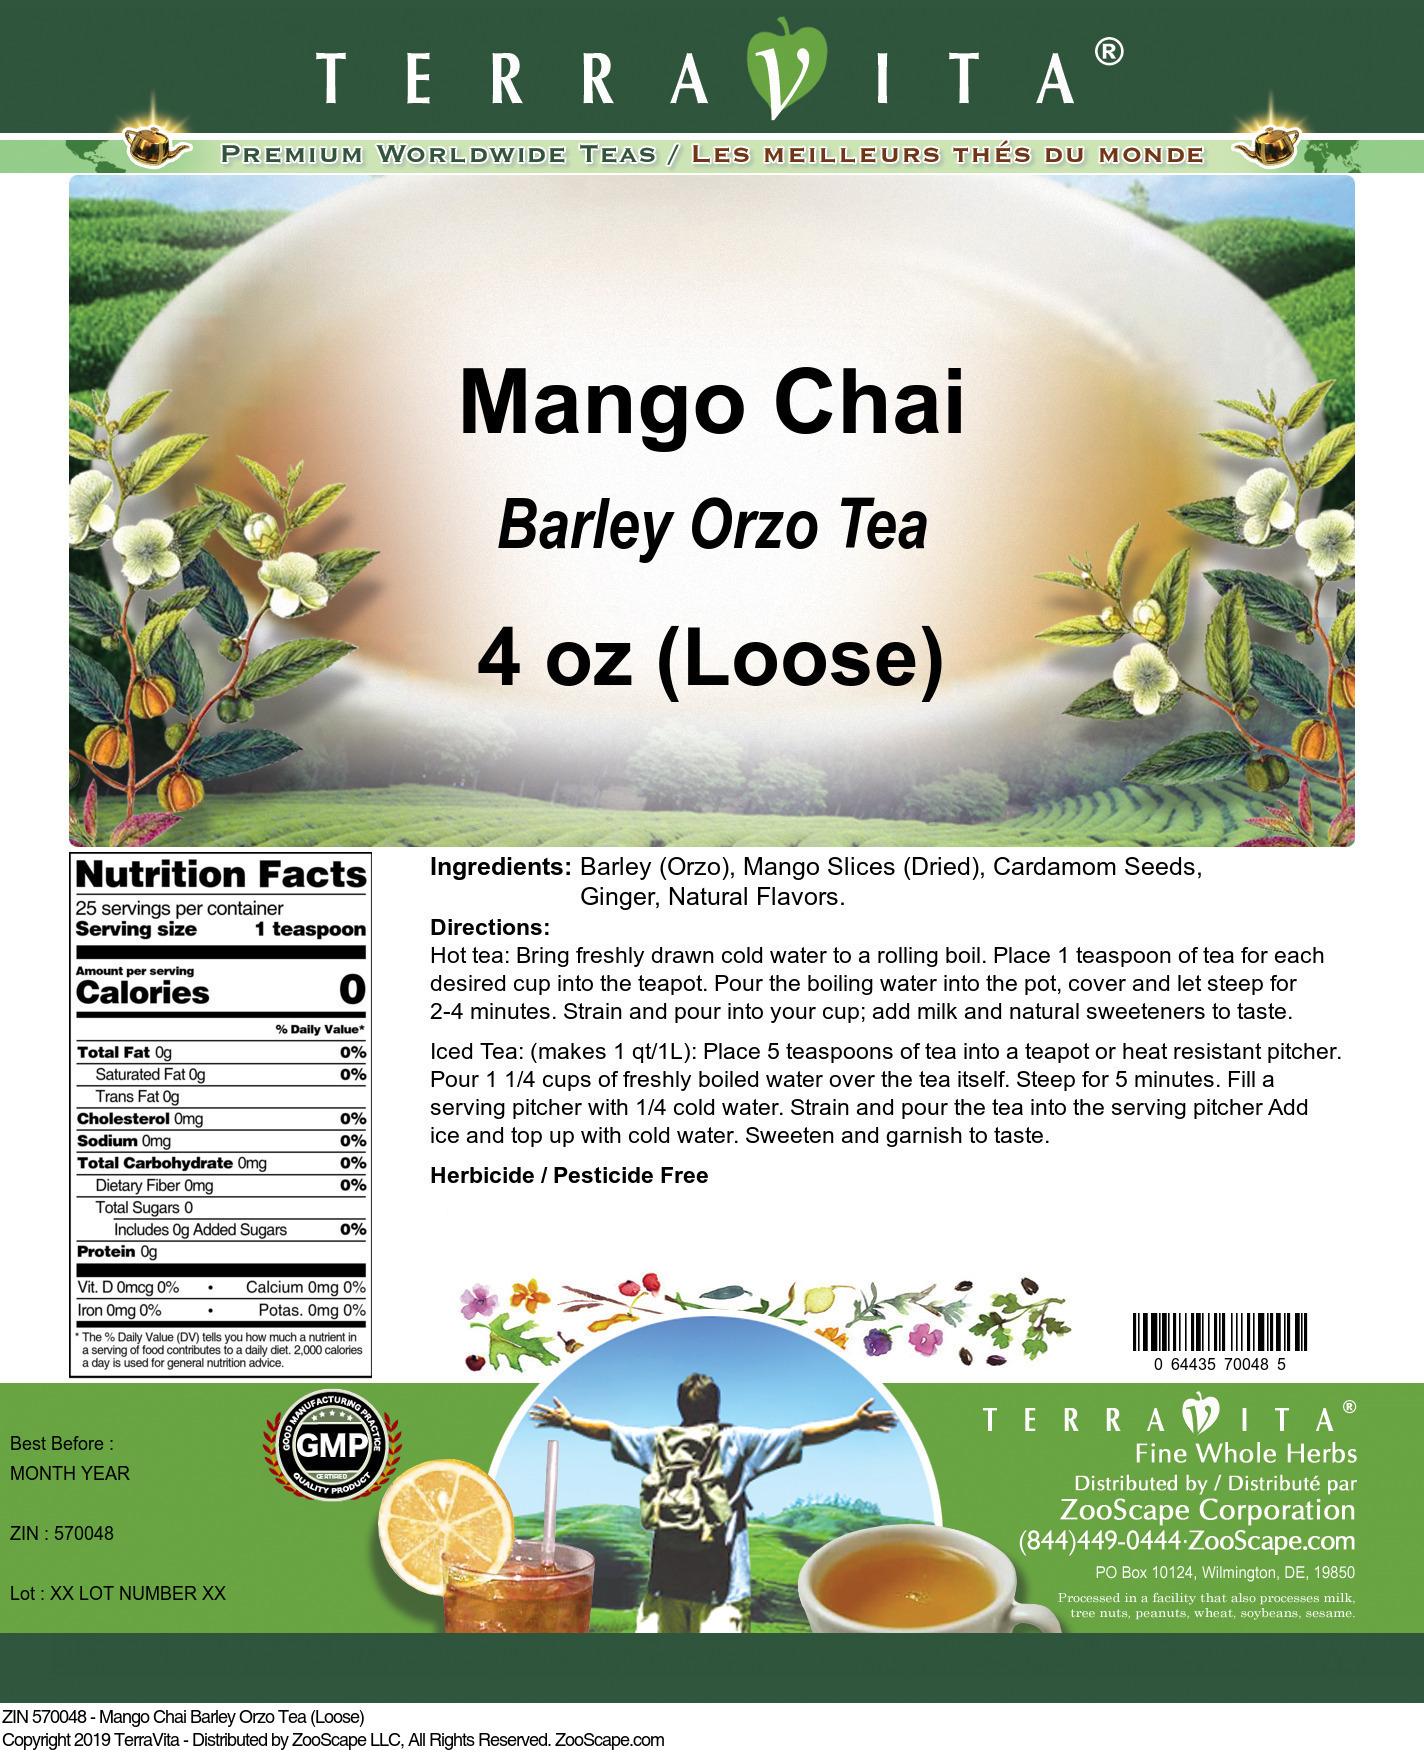 Mango Chai Barley Orzo